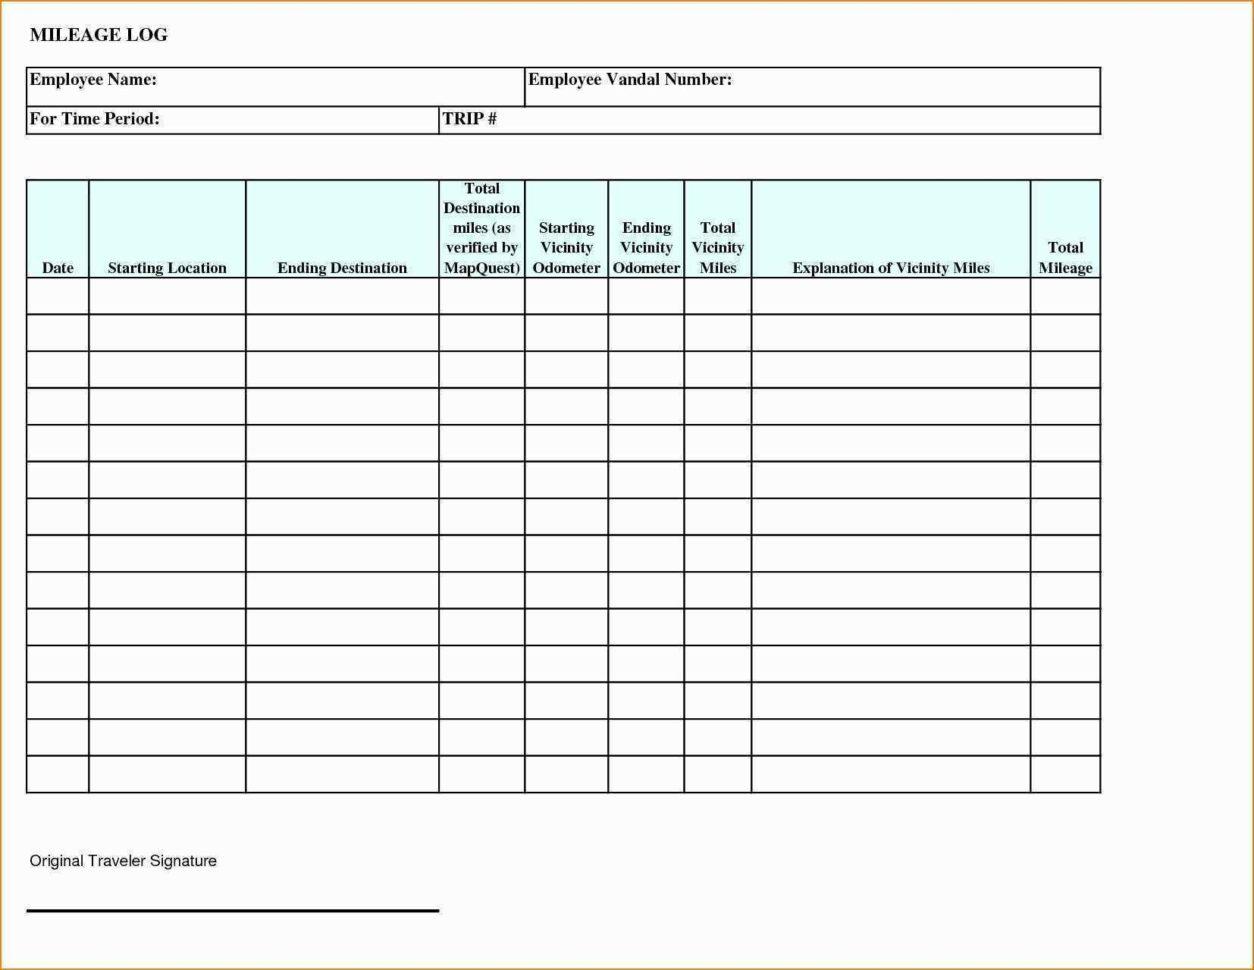 Mileage Log Spreadsheet Regarding Mileage Tracking Template Beautiful Mileage Reimbursement